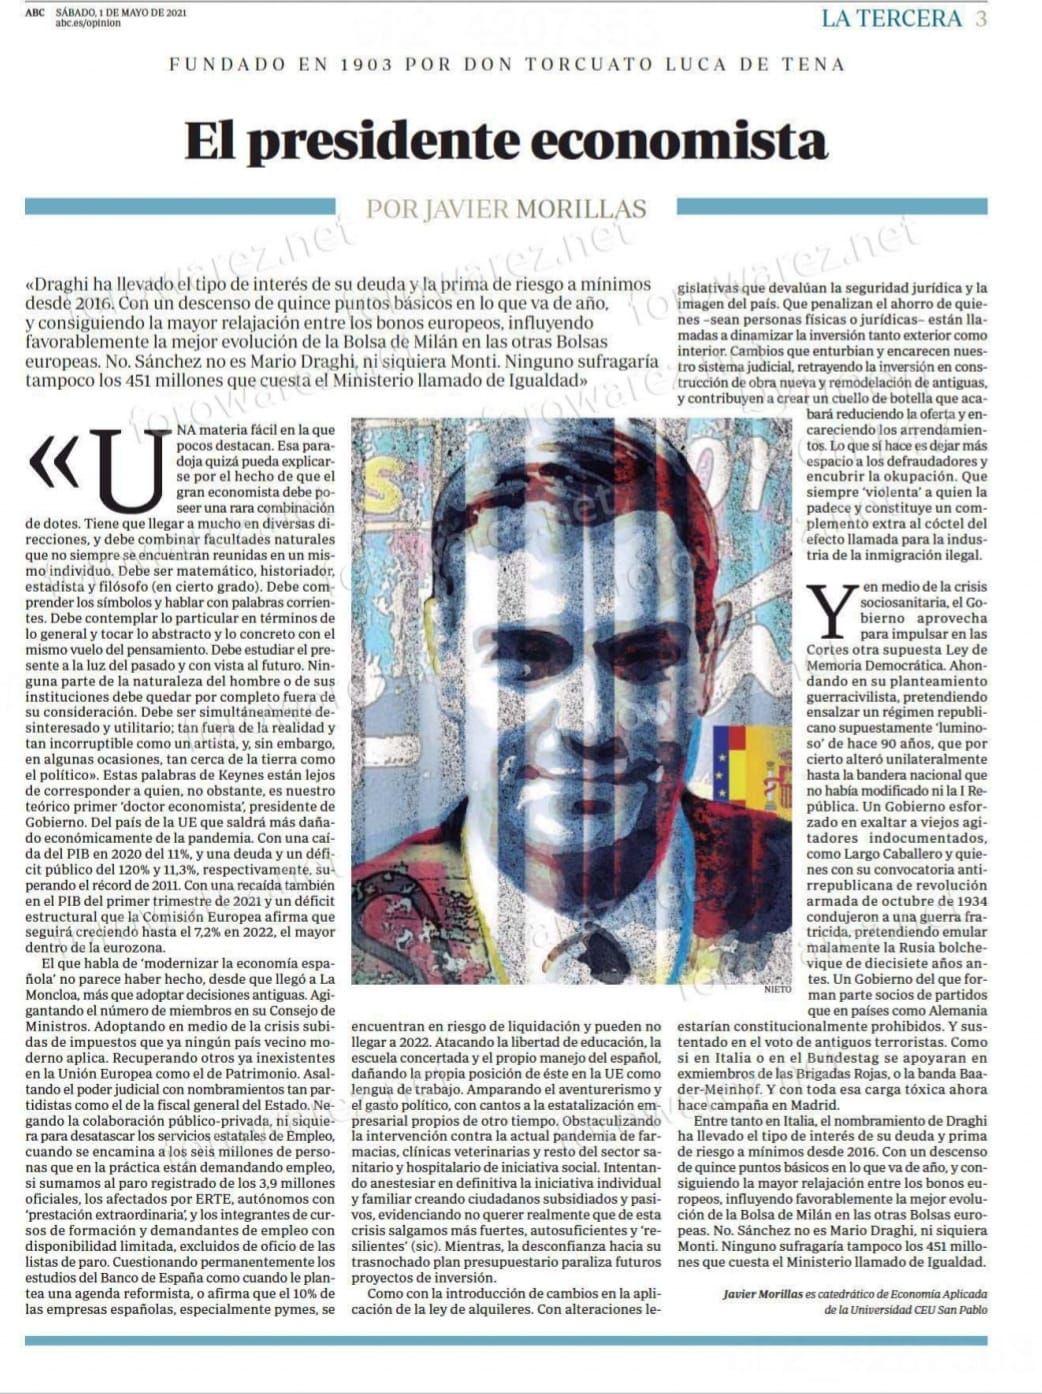 El presidente economista, por Javier Morillas